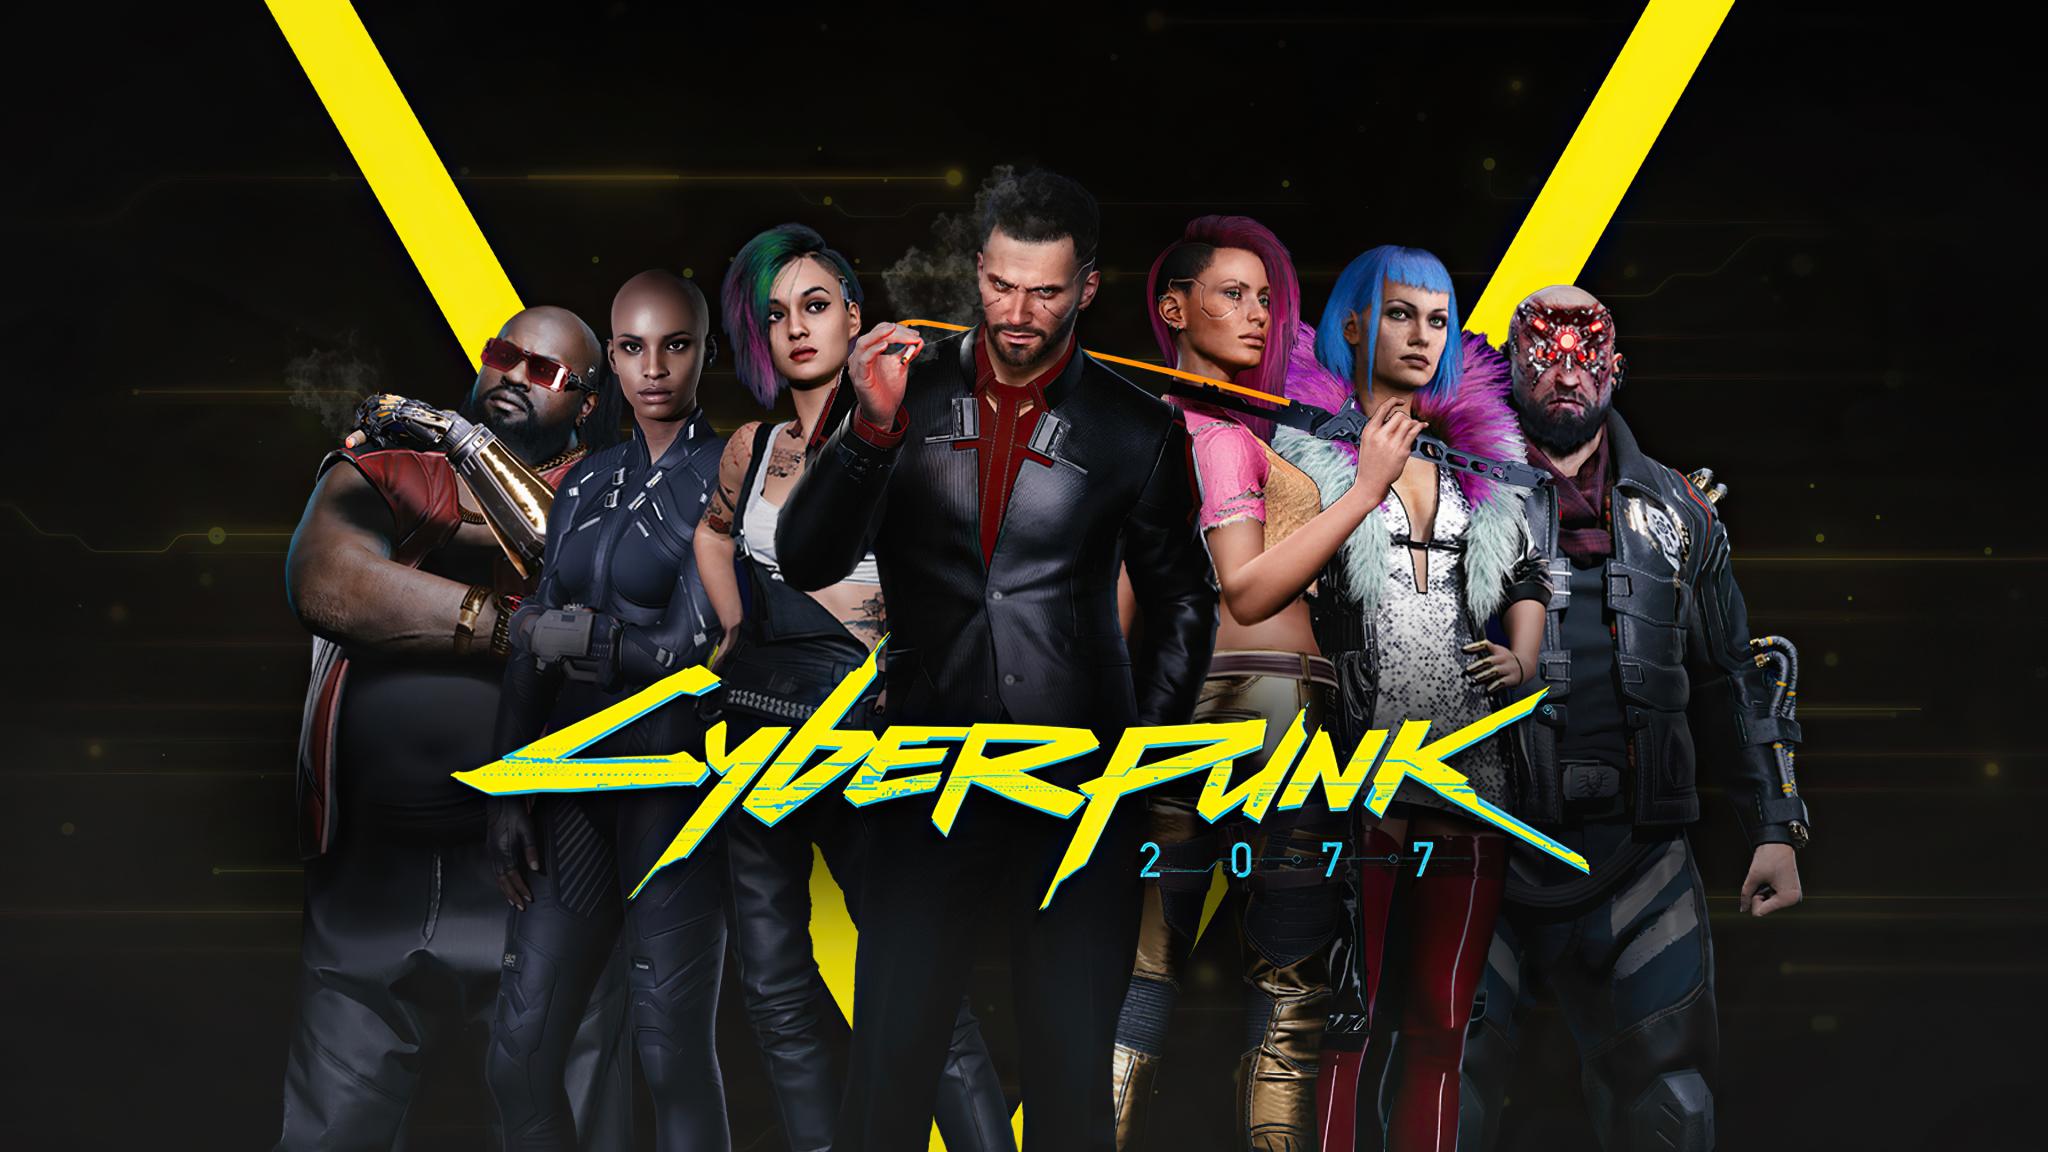 2048x1152 Cyberpunk 2077 4k Characters 2048x1152 ...